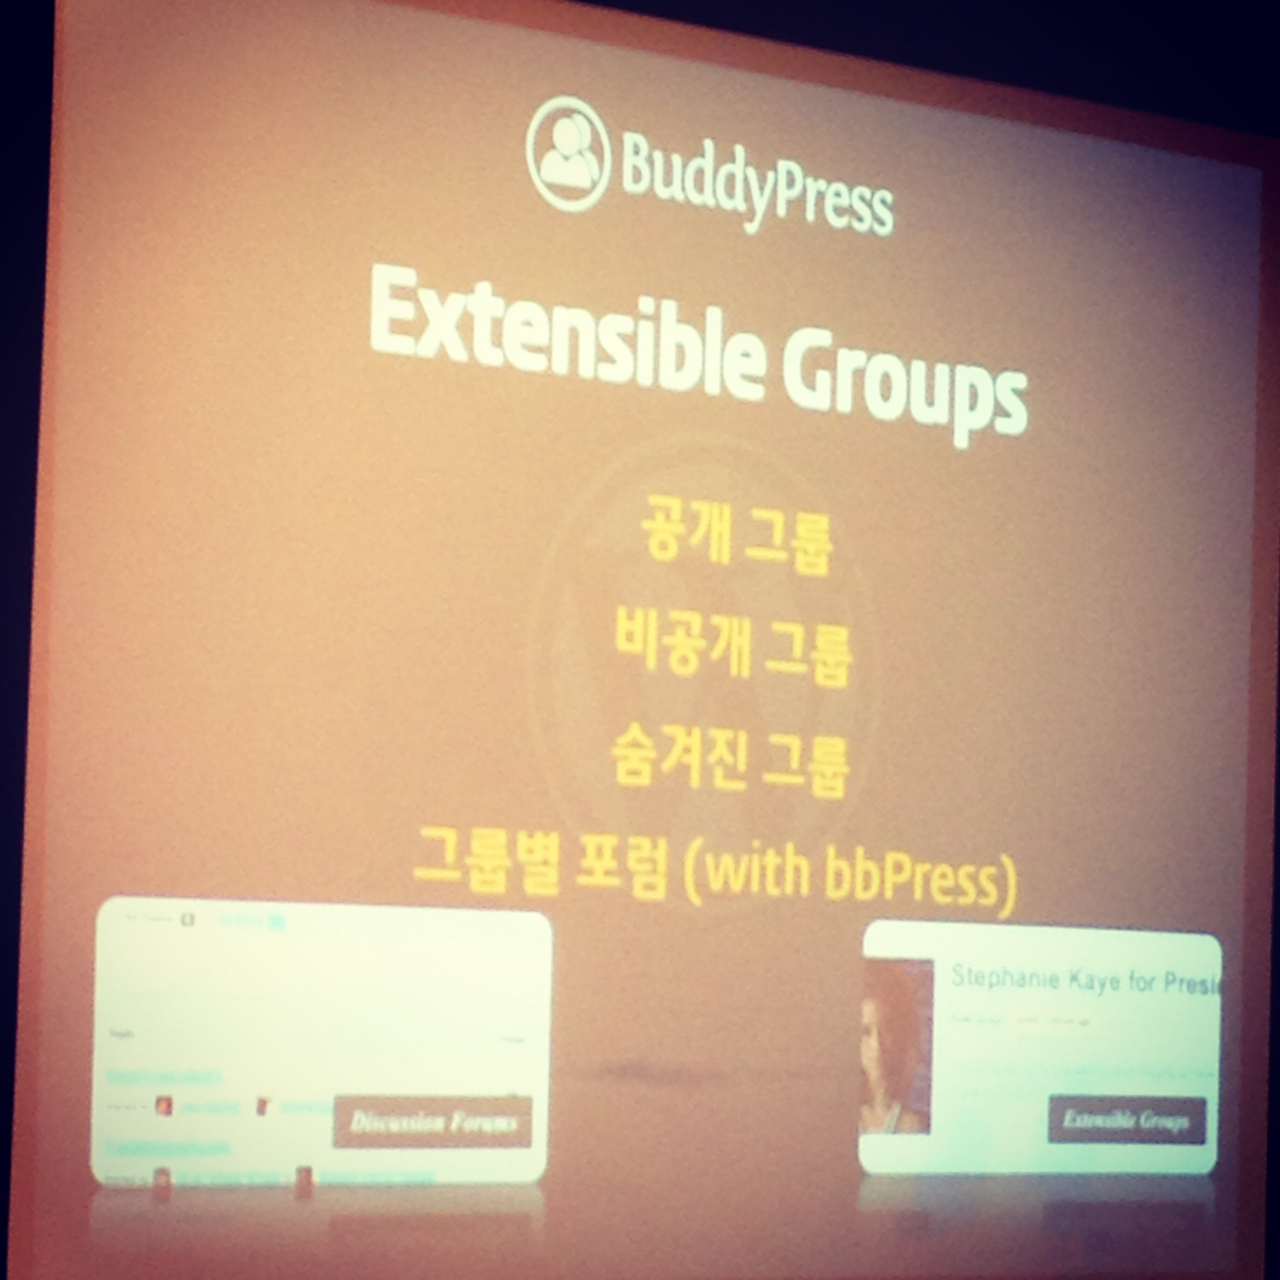 BuddyPressの機能を軽く全部紹介していました